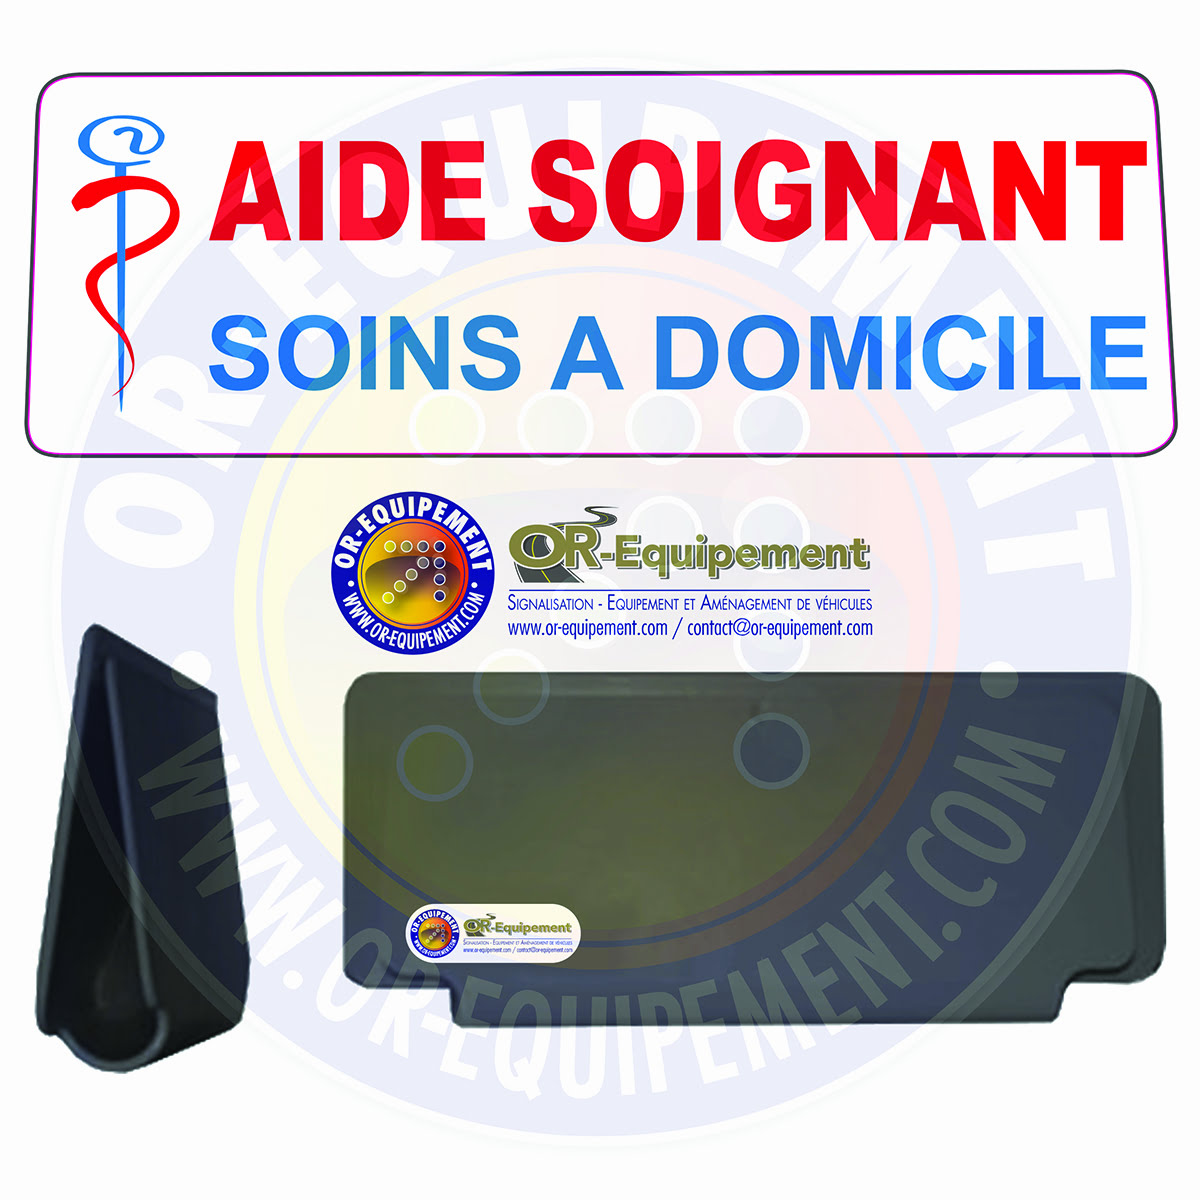 CLIP RETRO-REFLECHISSANT AIDE SOIGNANT SOINS A DOMICILE  Or Equipement